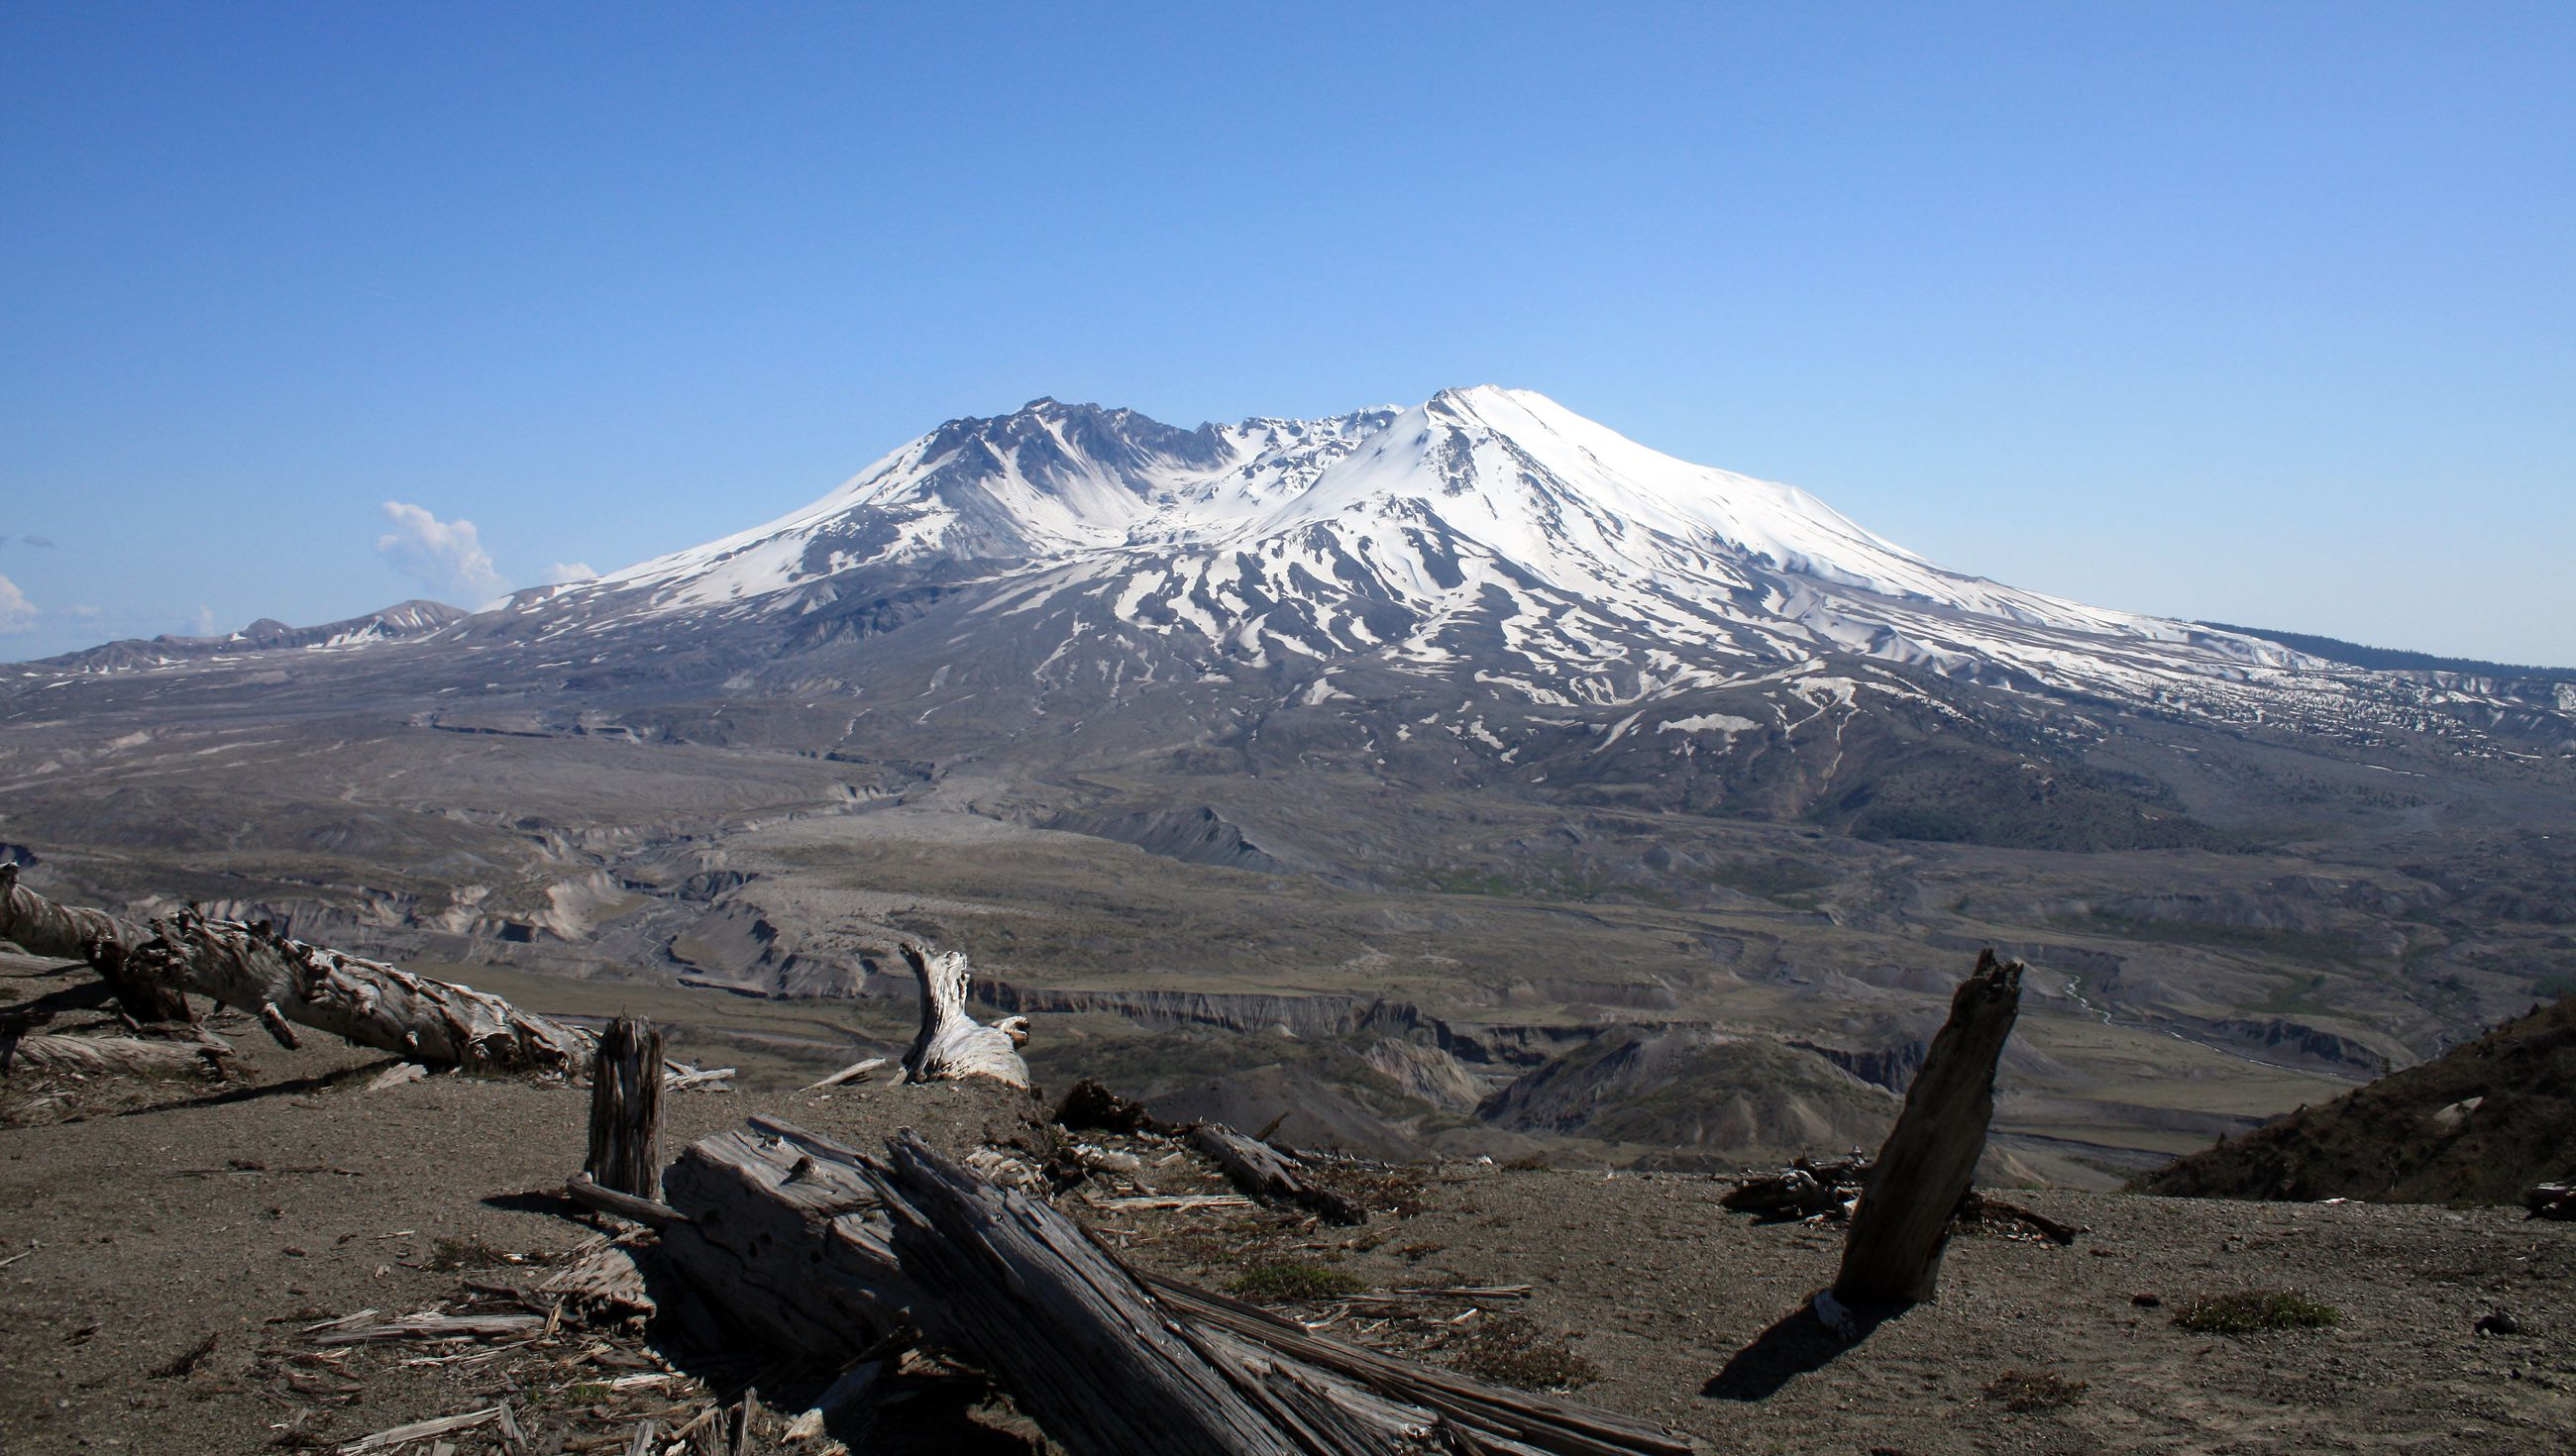 mount st helens eruption facts amp information live science - HD2600×1470